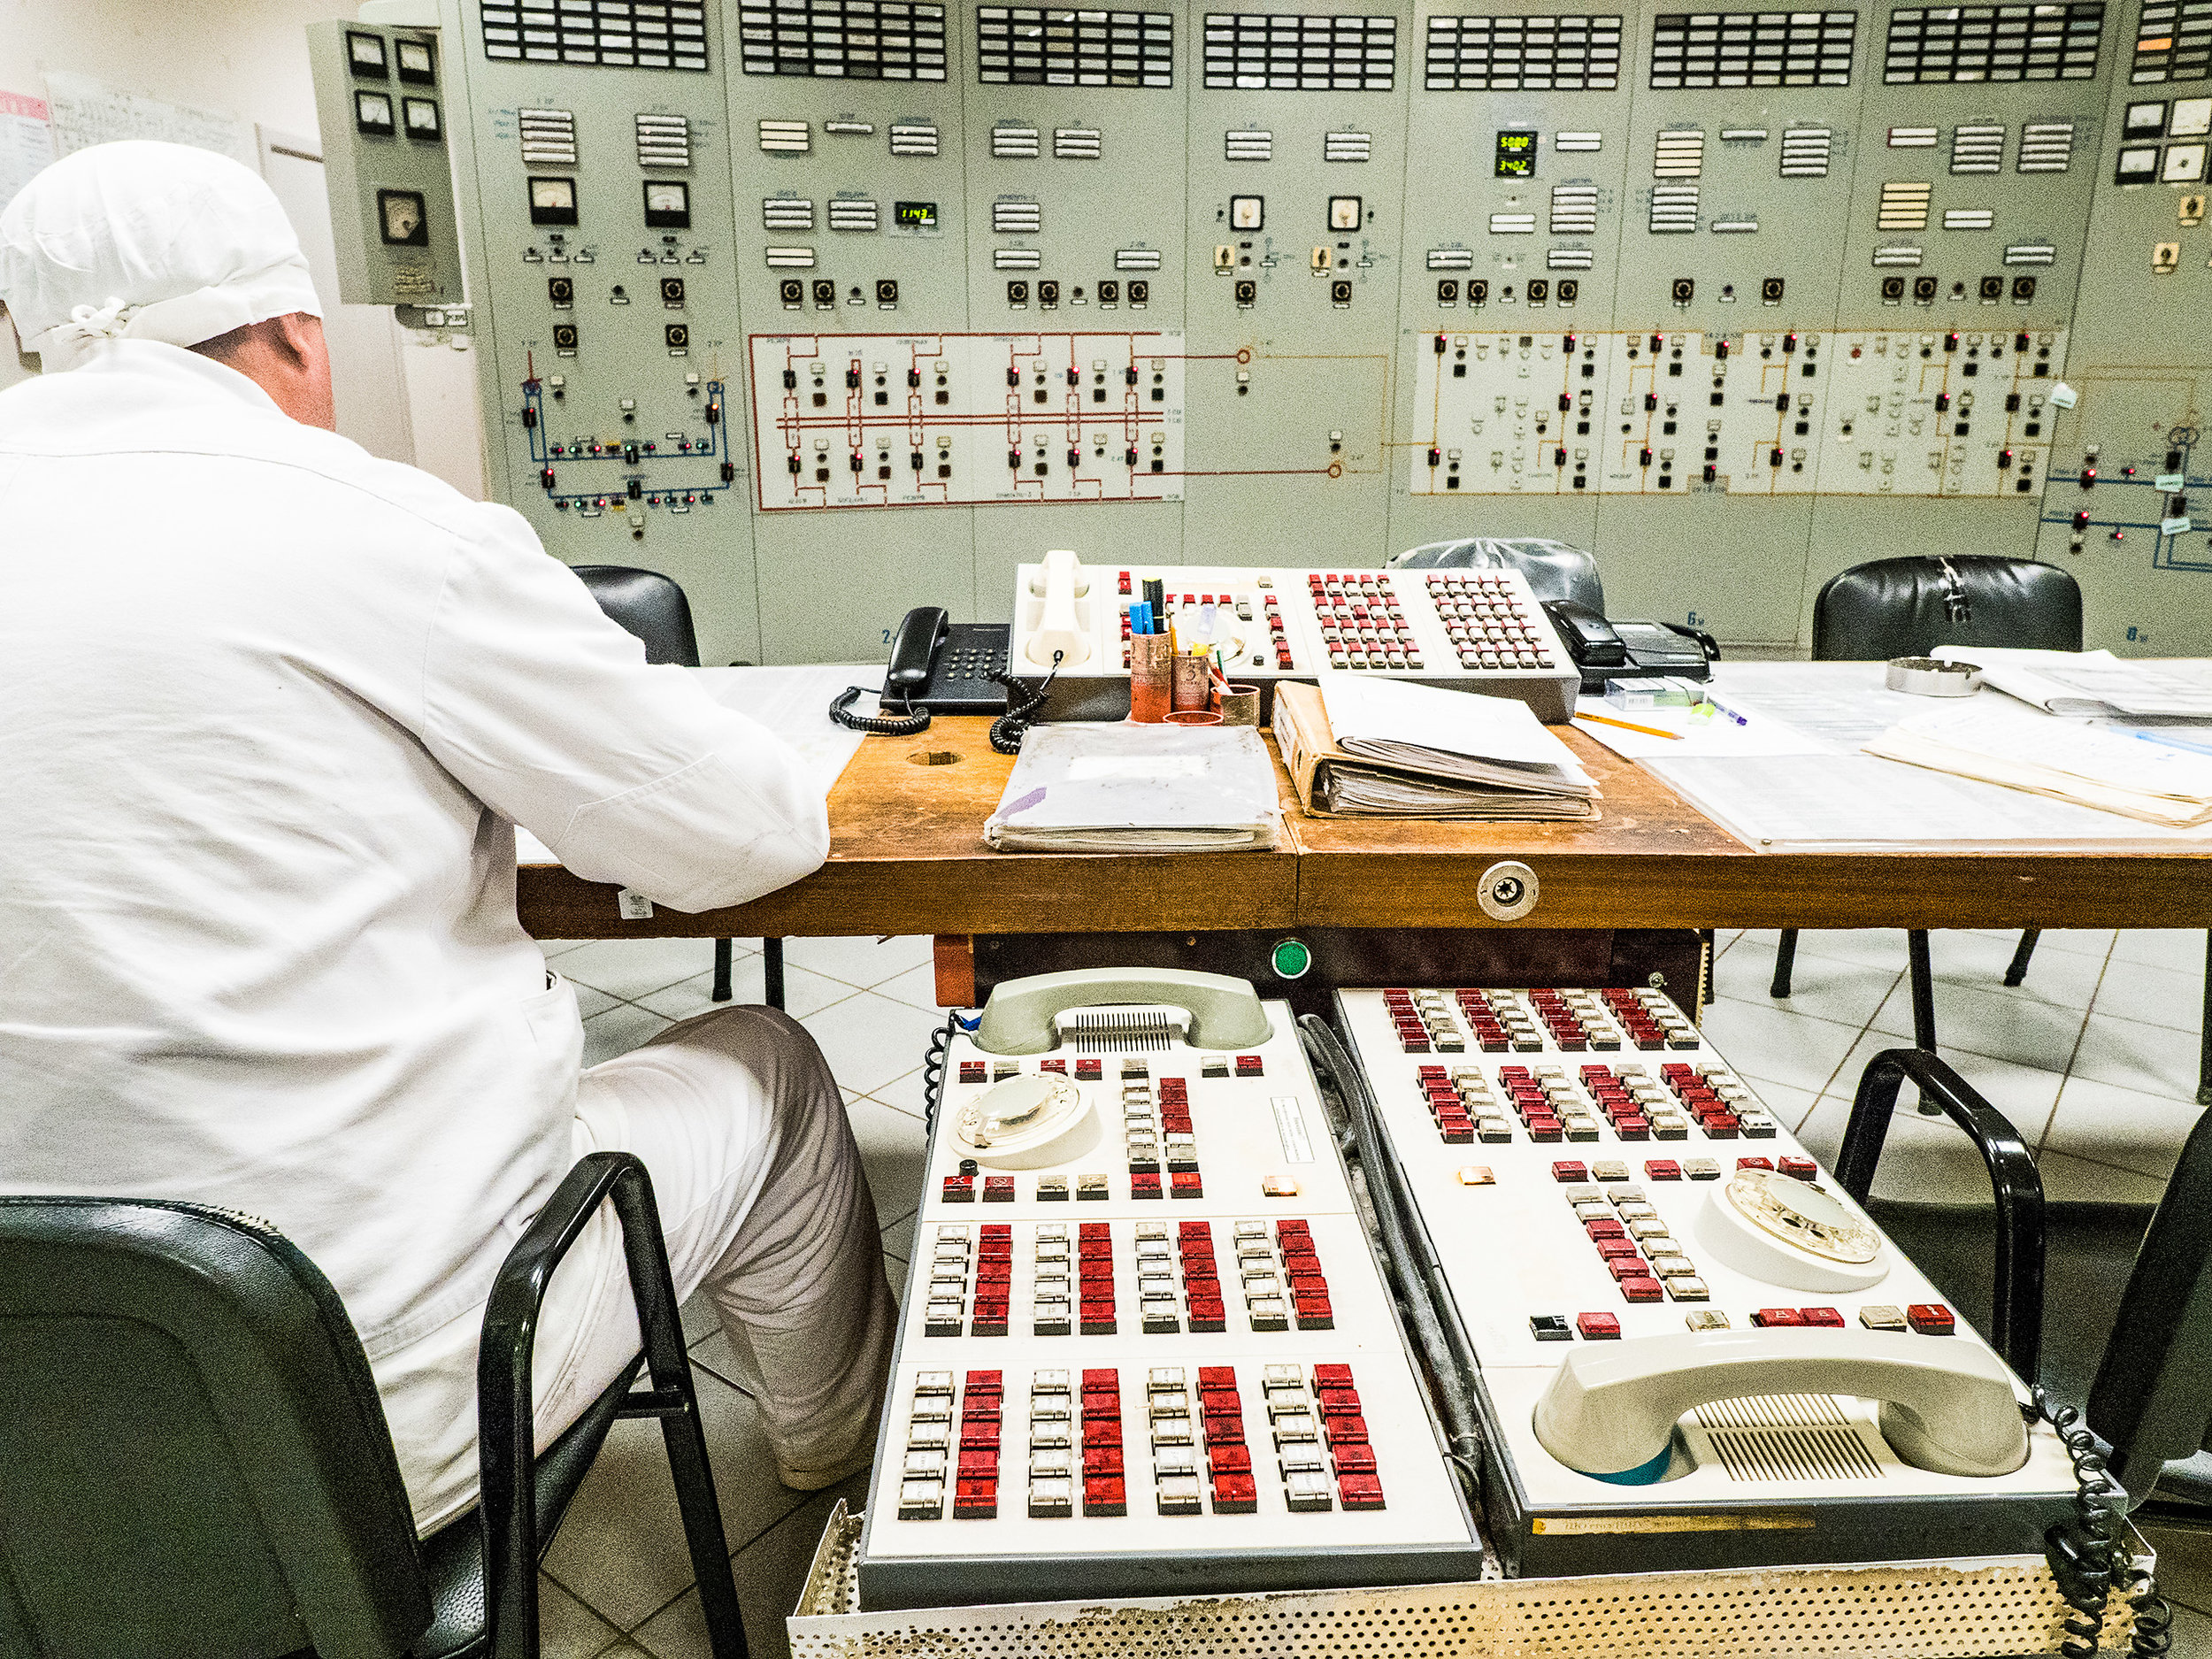 Eric Berger: Kernkraftwerk Tschernobyl